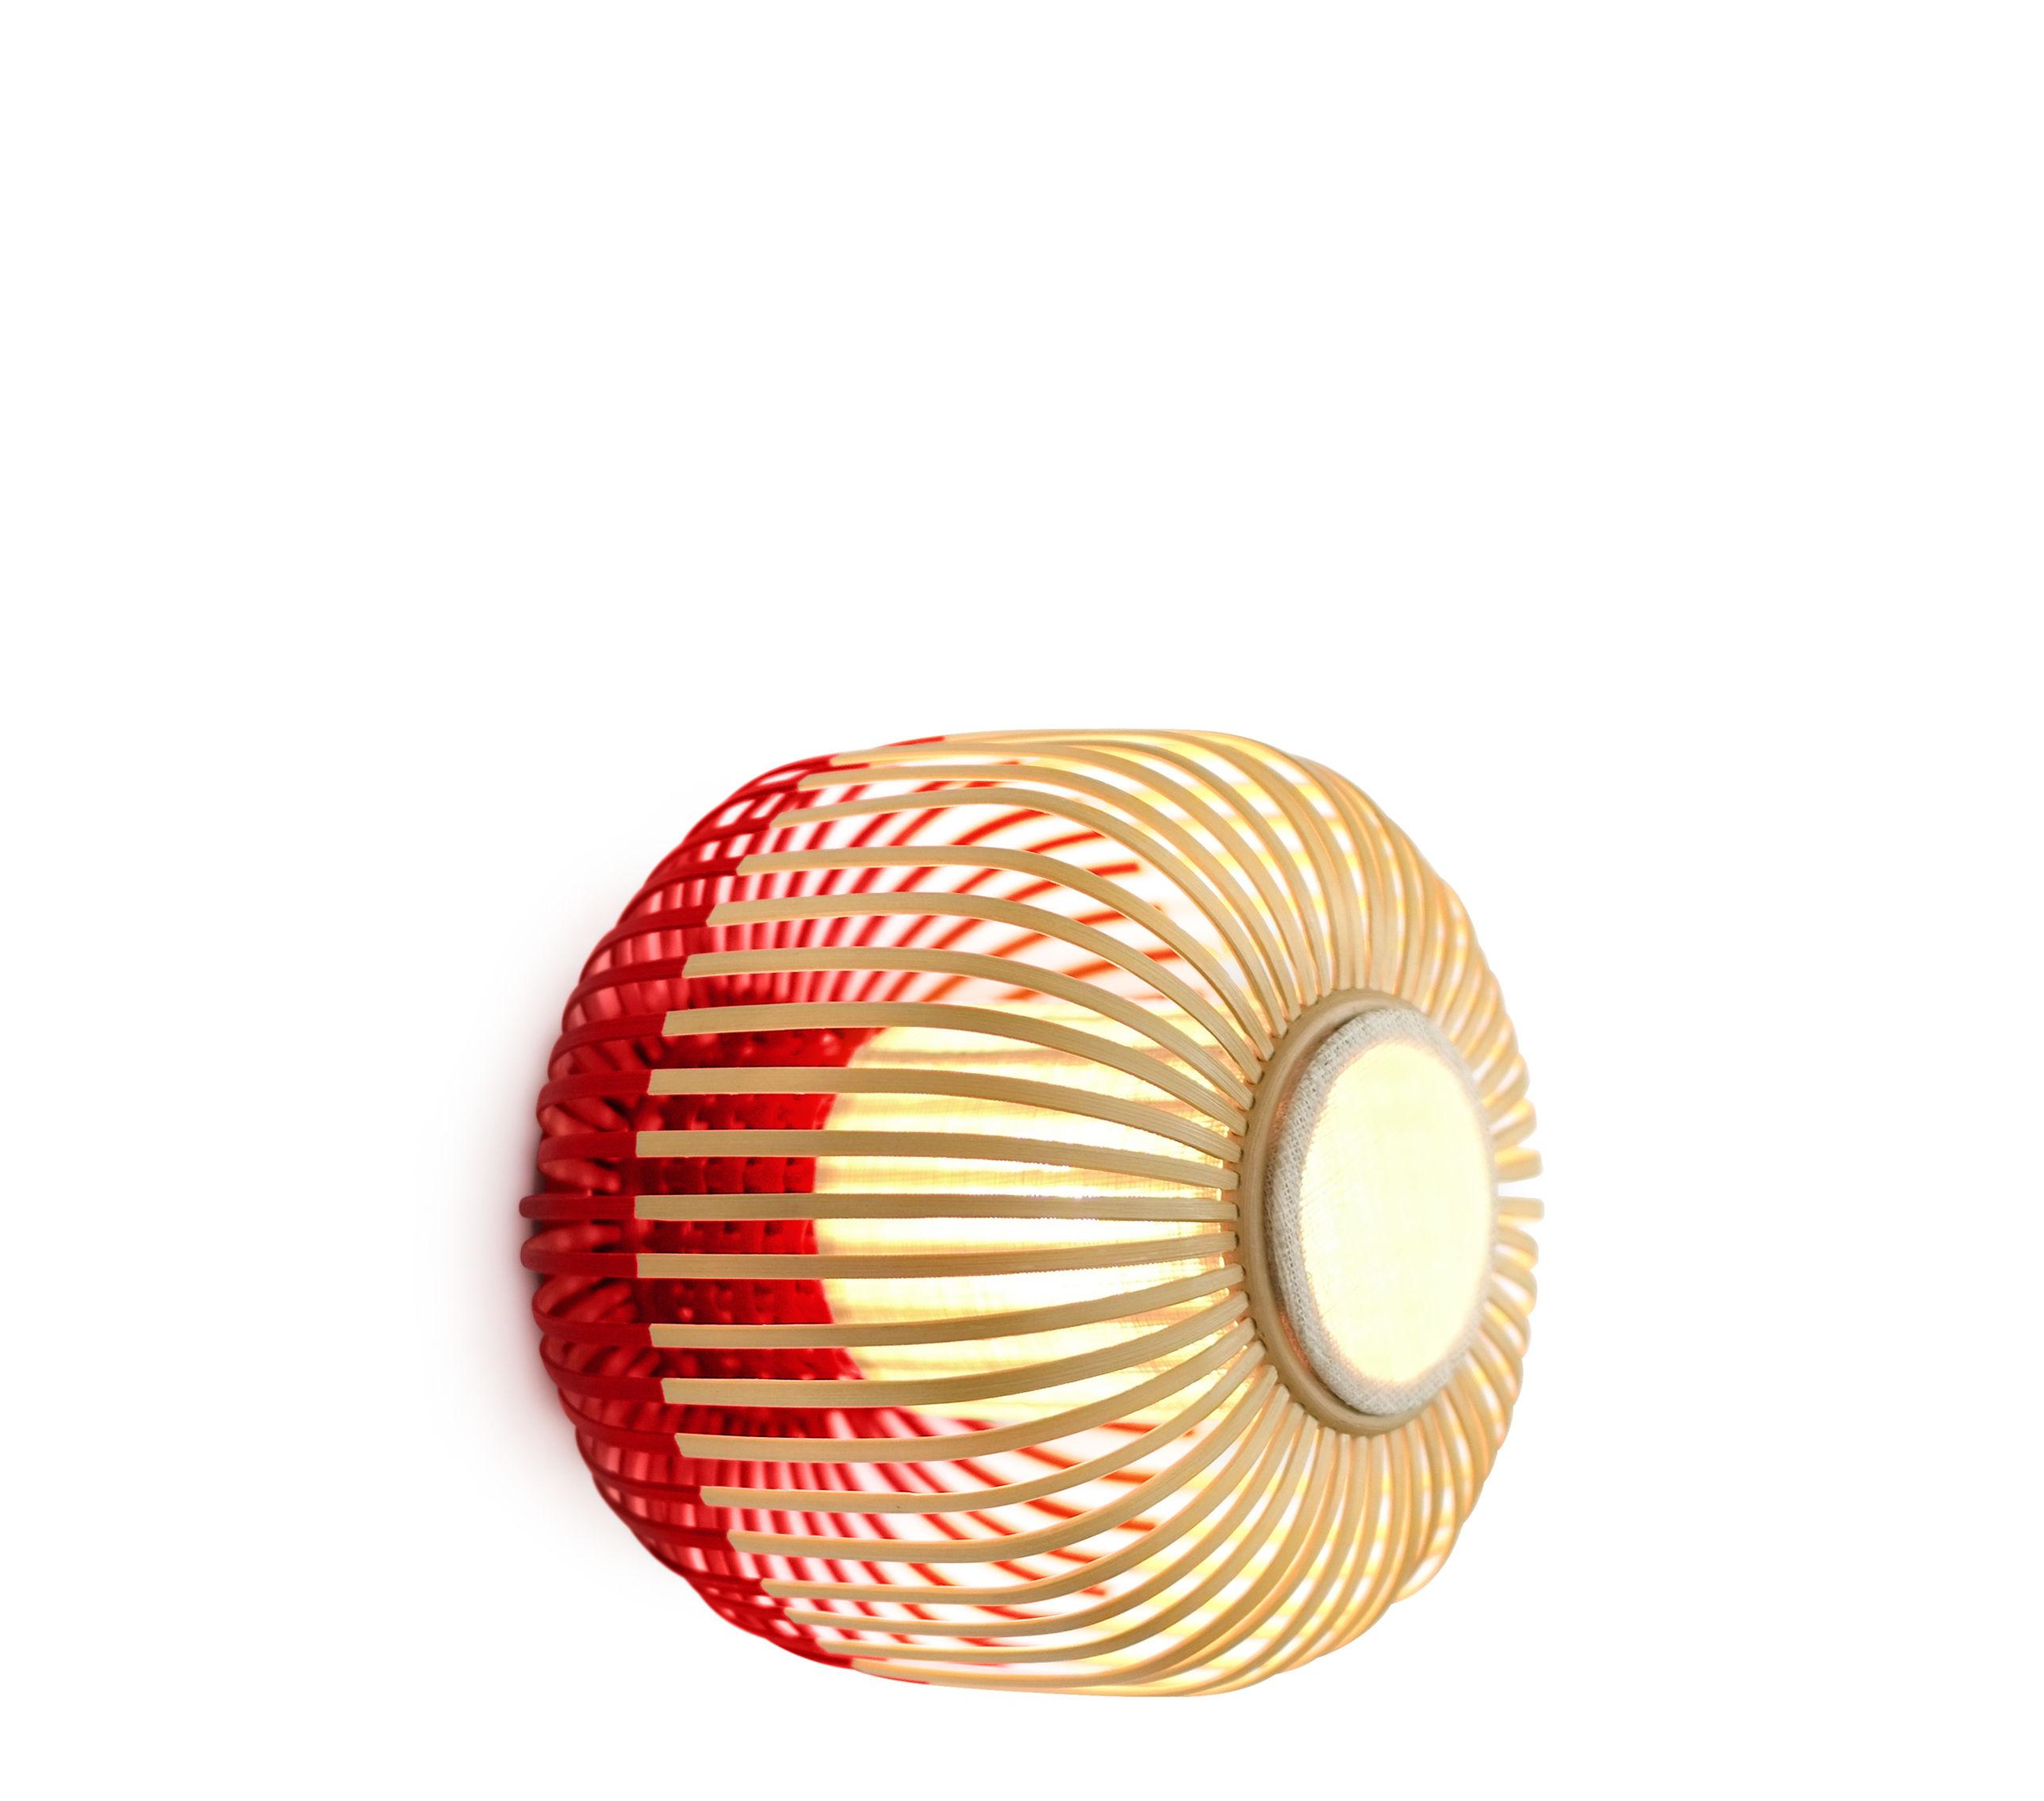 Illuminazione - Lampade da parete - Applique Bamboo light XS / Plafoniera - Ø 27 x H 20 cm - Forestier - Rouge / Naturel - Bambù naturale, Tessuto